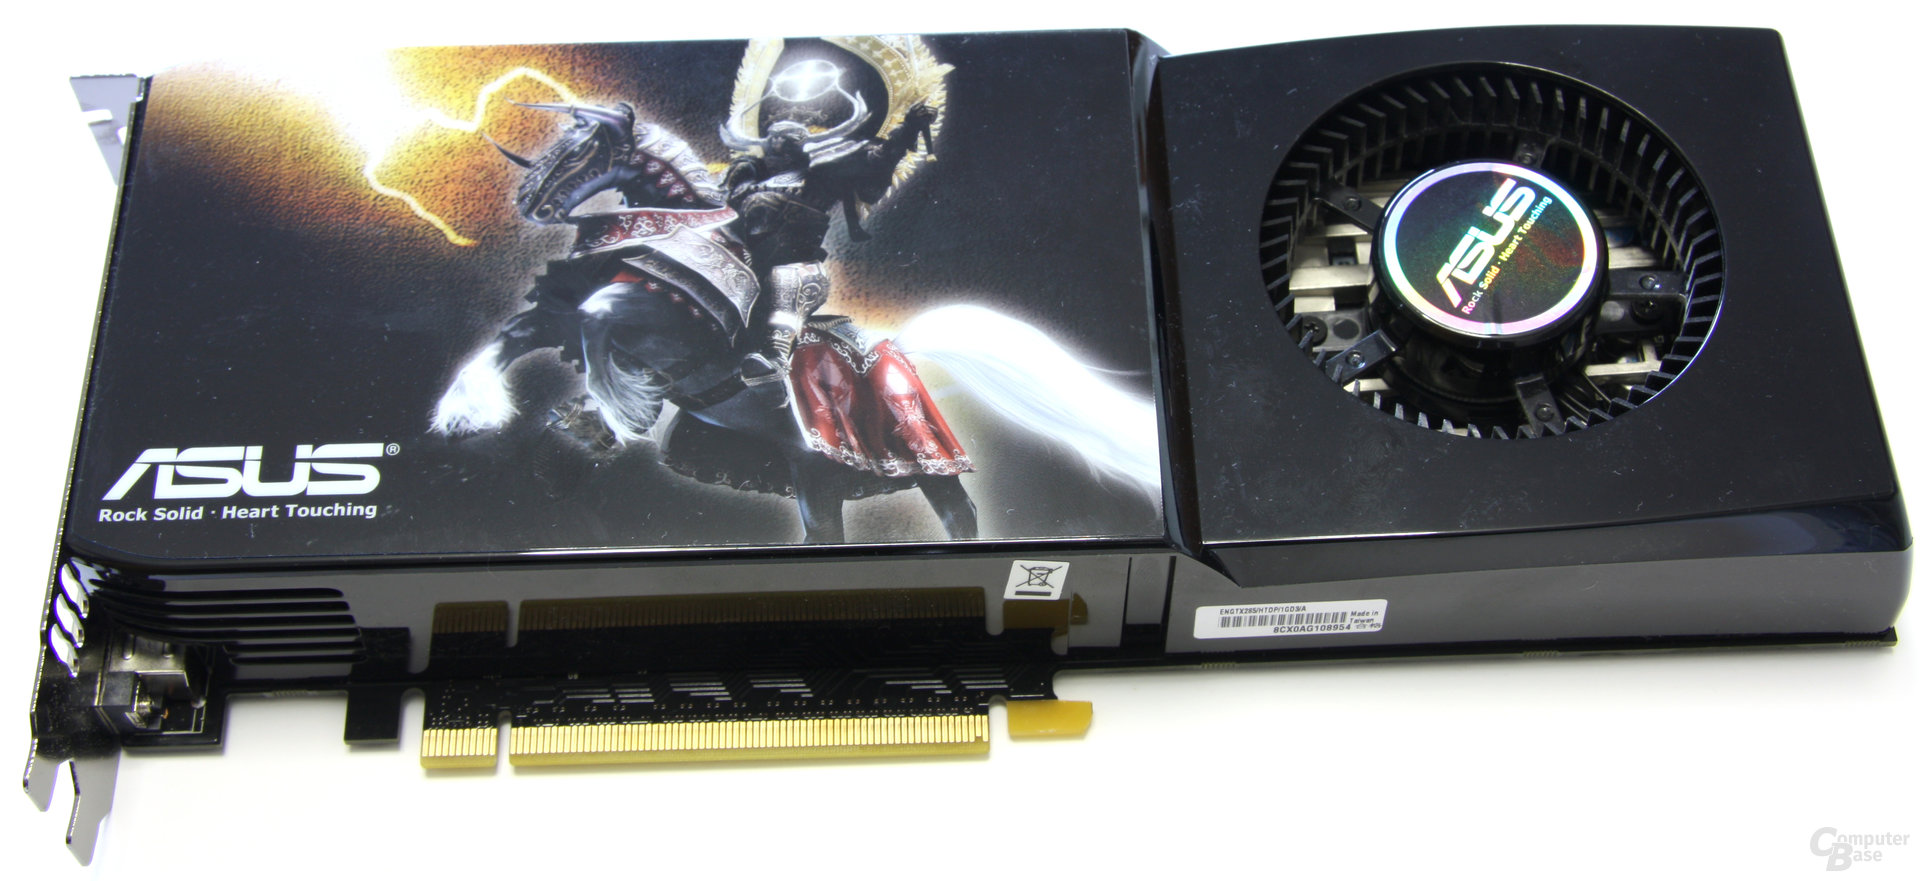 Asus GeForce GTX 285